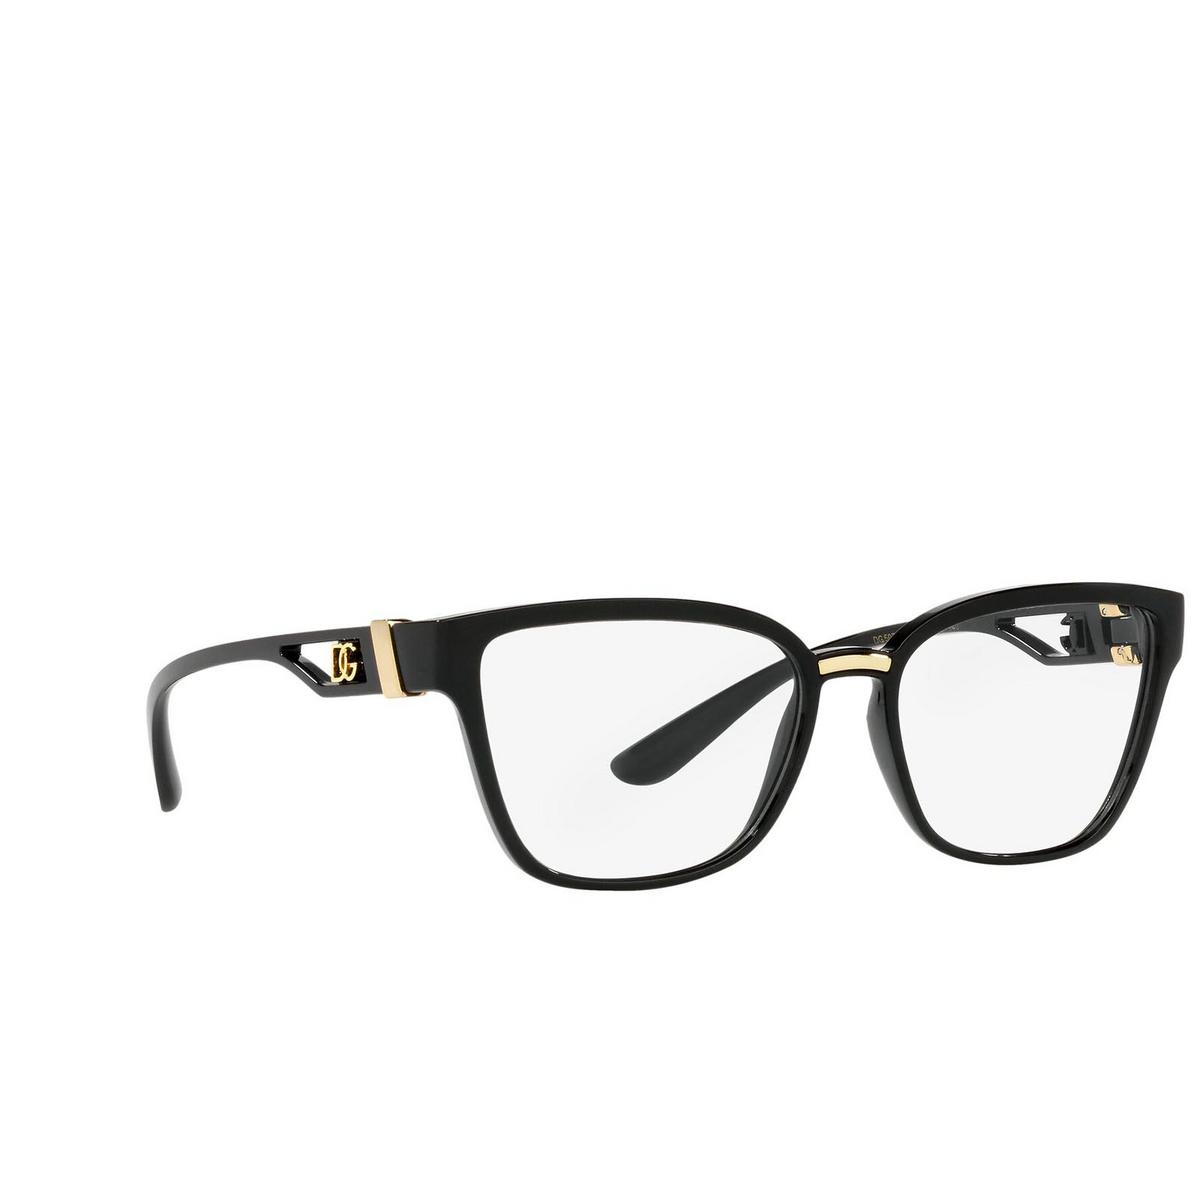 Dolce & Gabbana® Cat-eye Eyeglasses: DG5070 color Black 501 - three-quarters view.